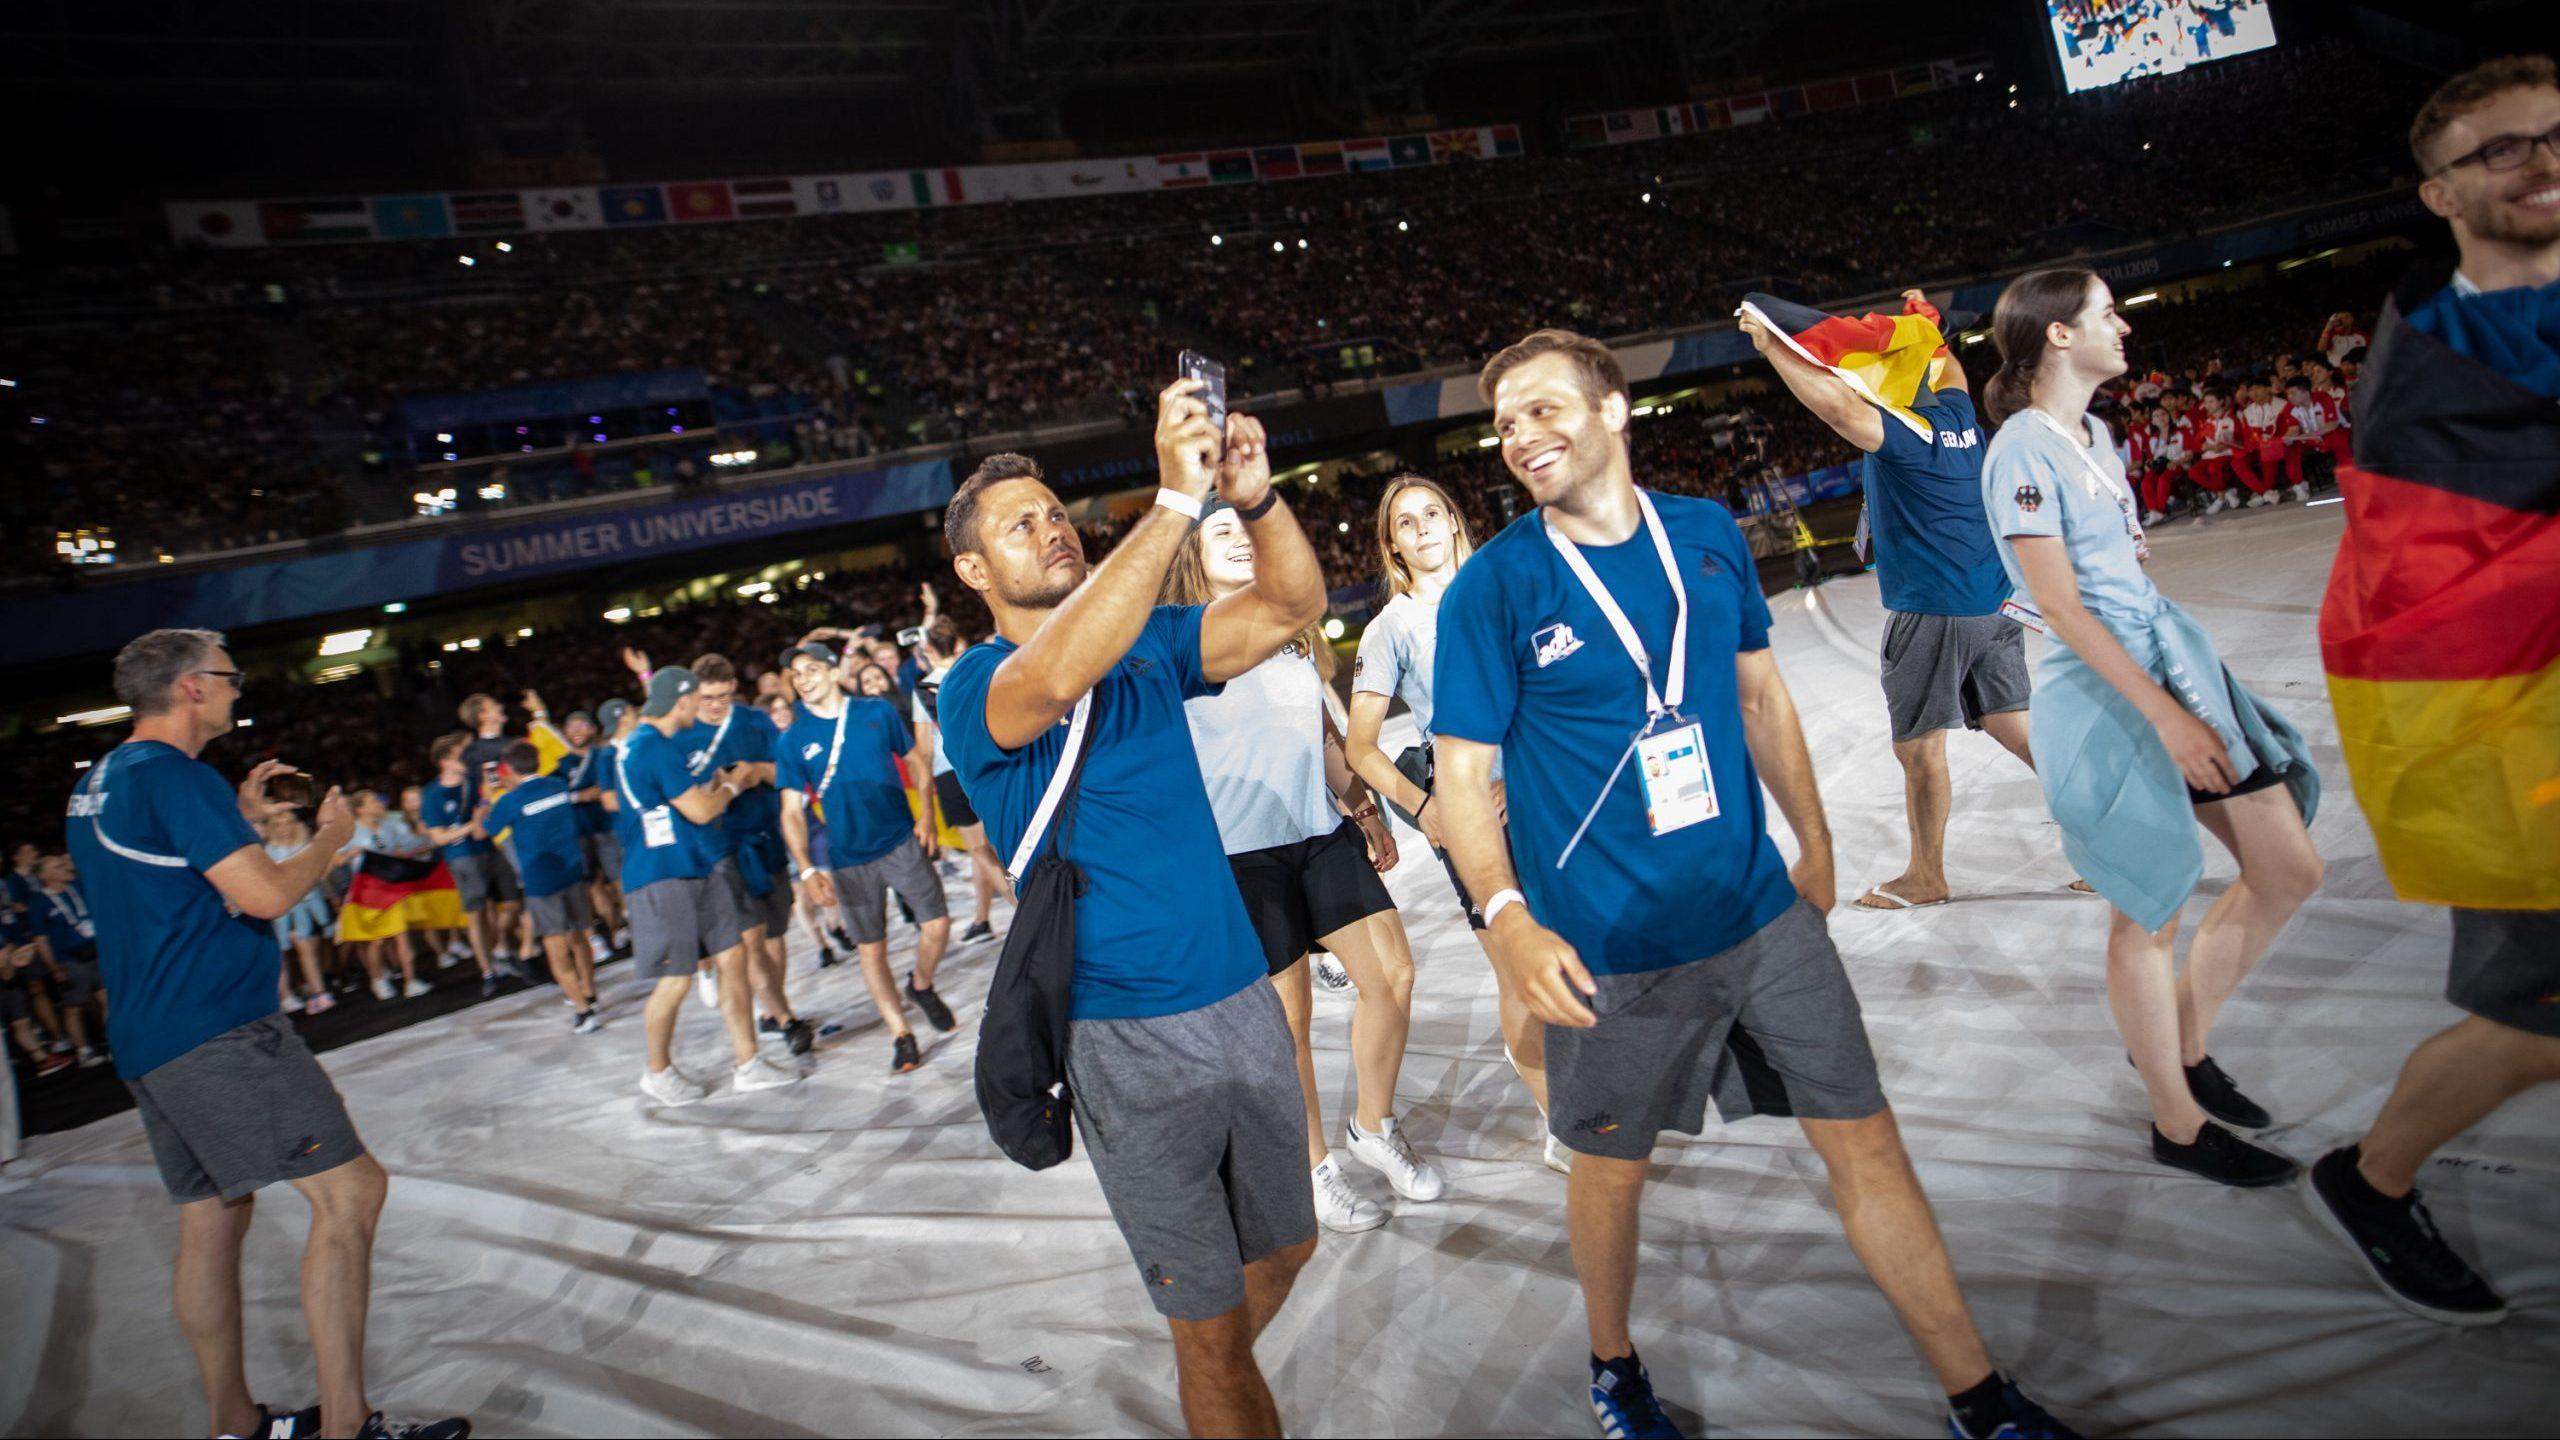 Kommt die Universiade 2025 nach Düsseldorf?